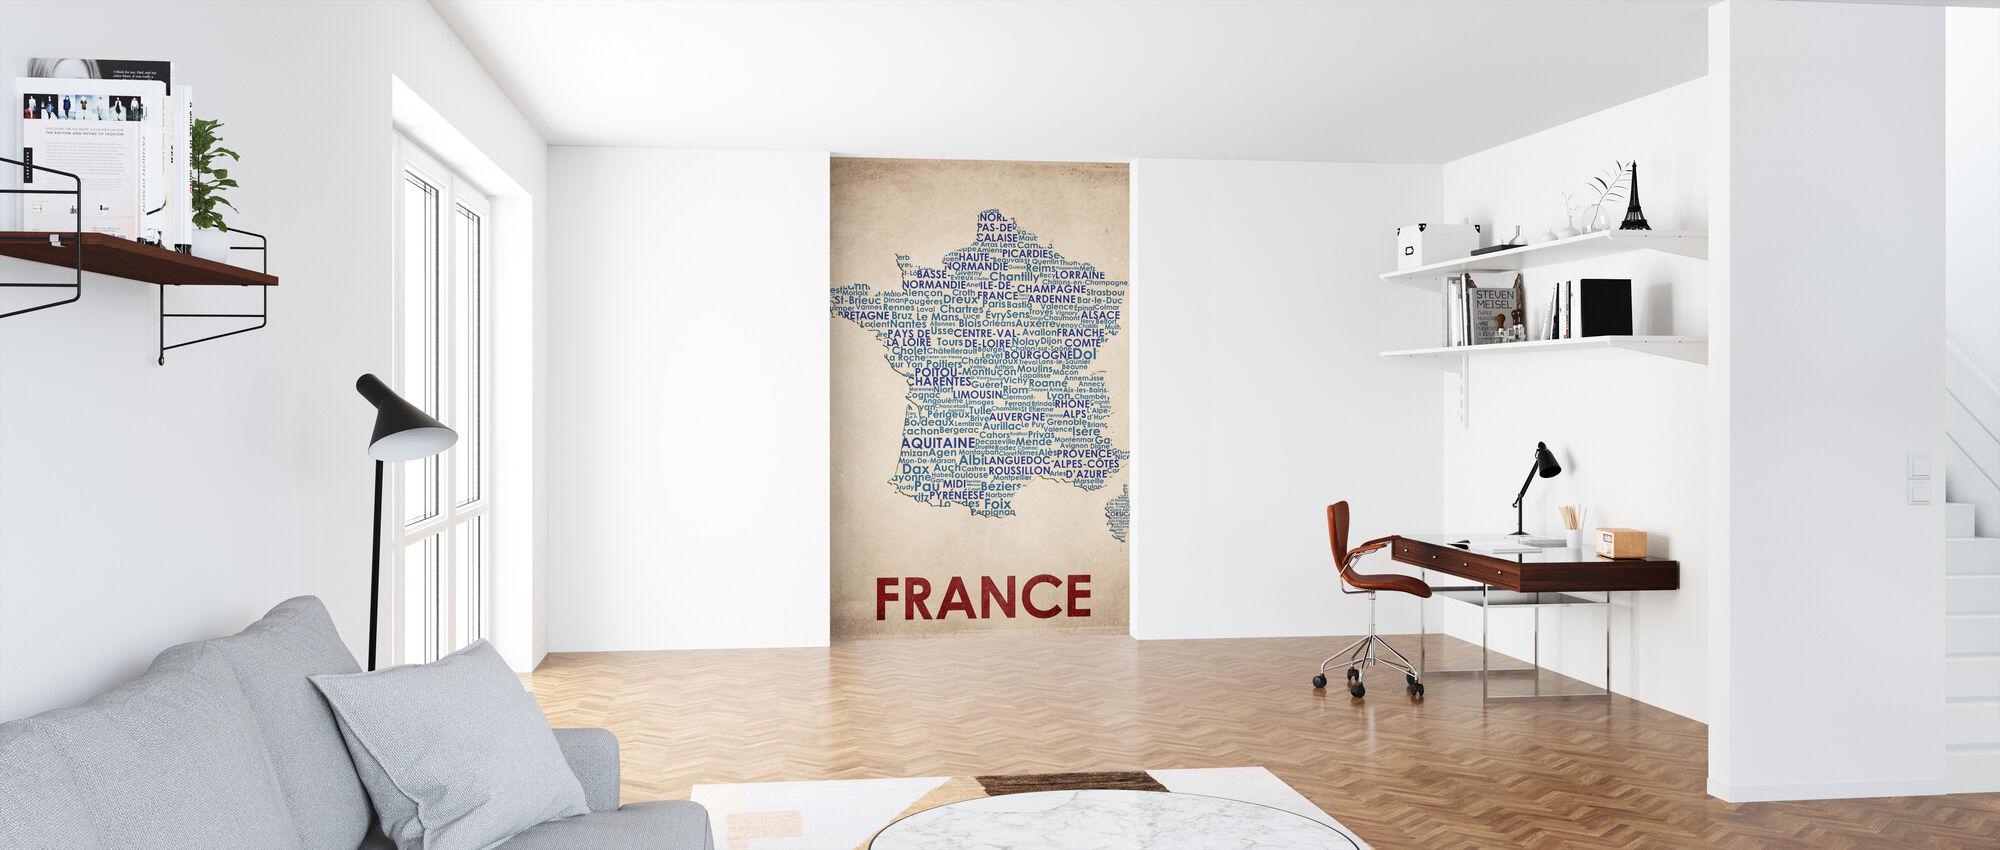 France Map - Wallpaper - Office